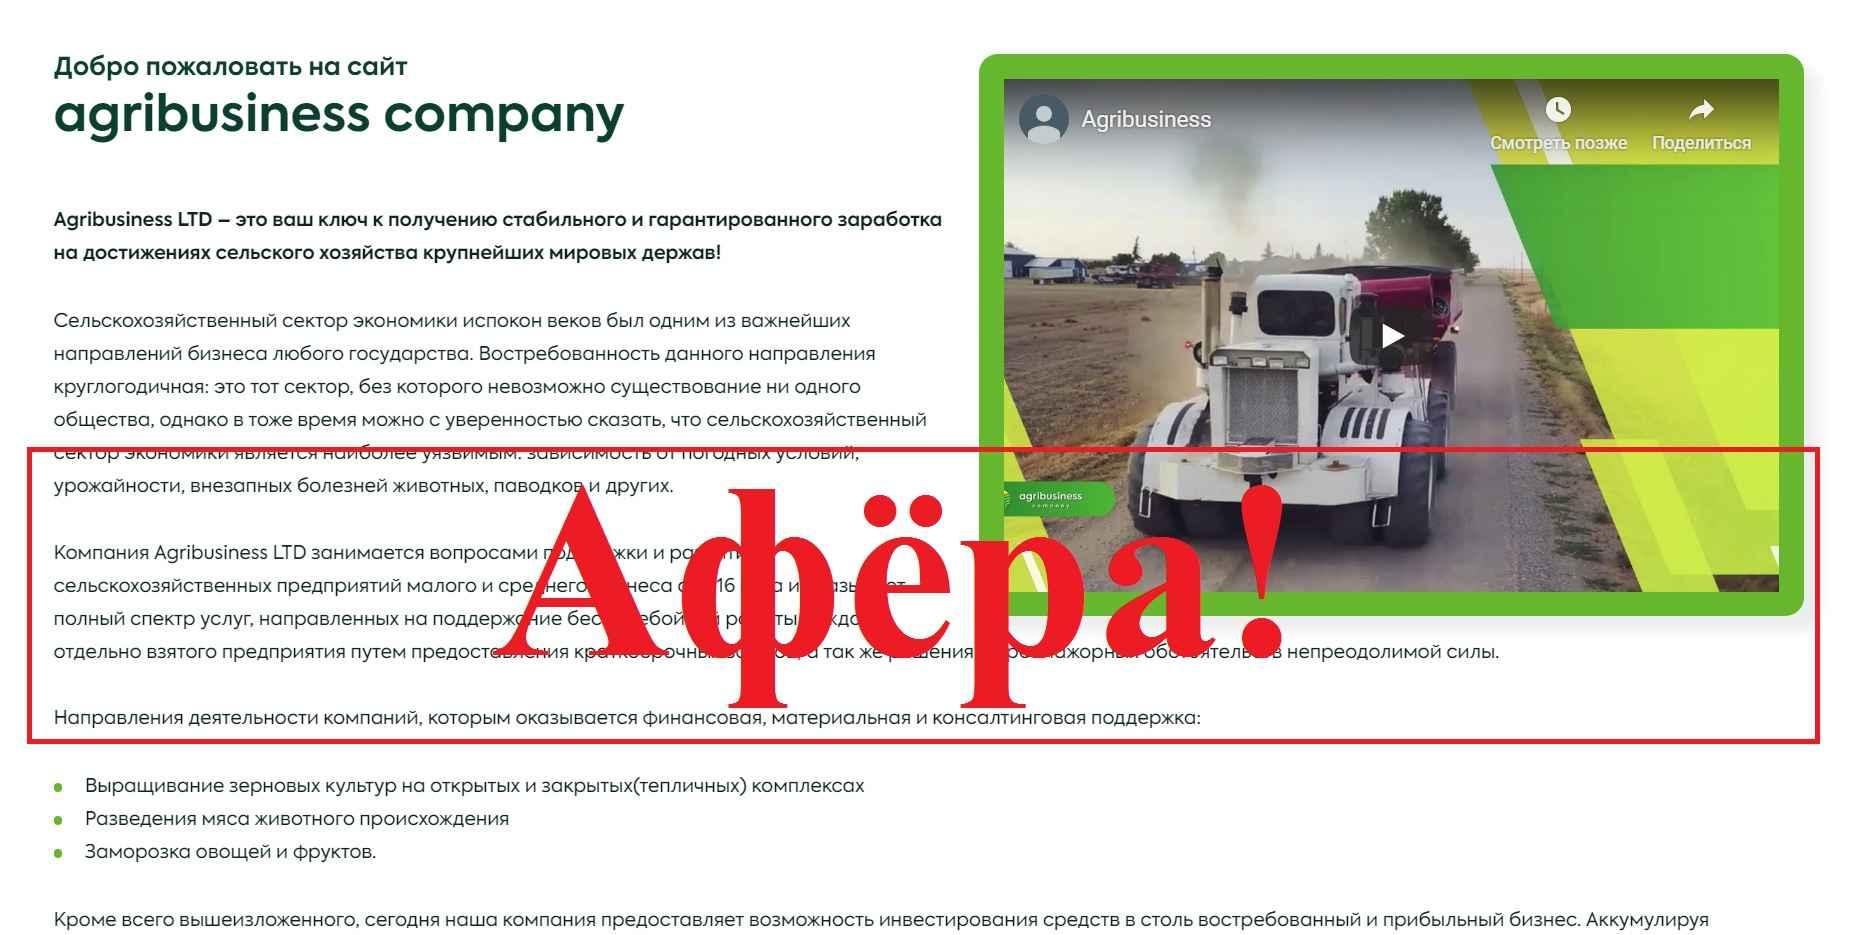 Agribusiness – отзывы о компании agribusiness.biz